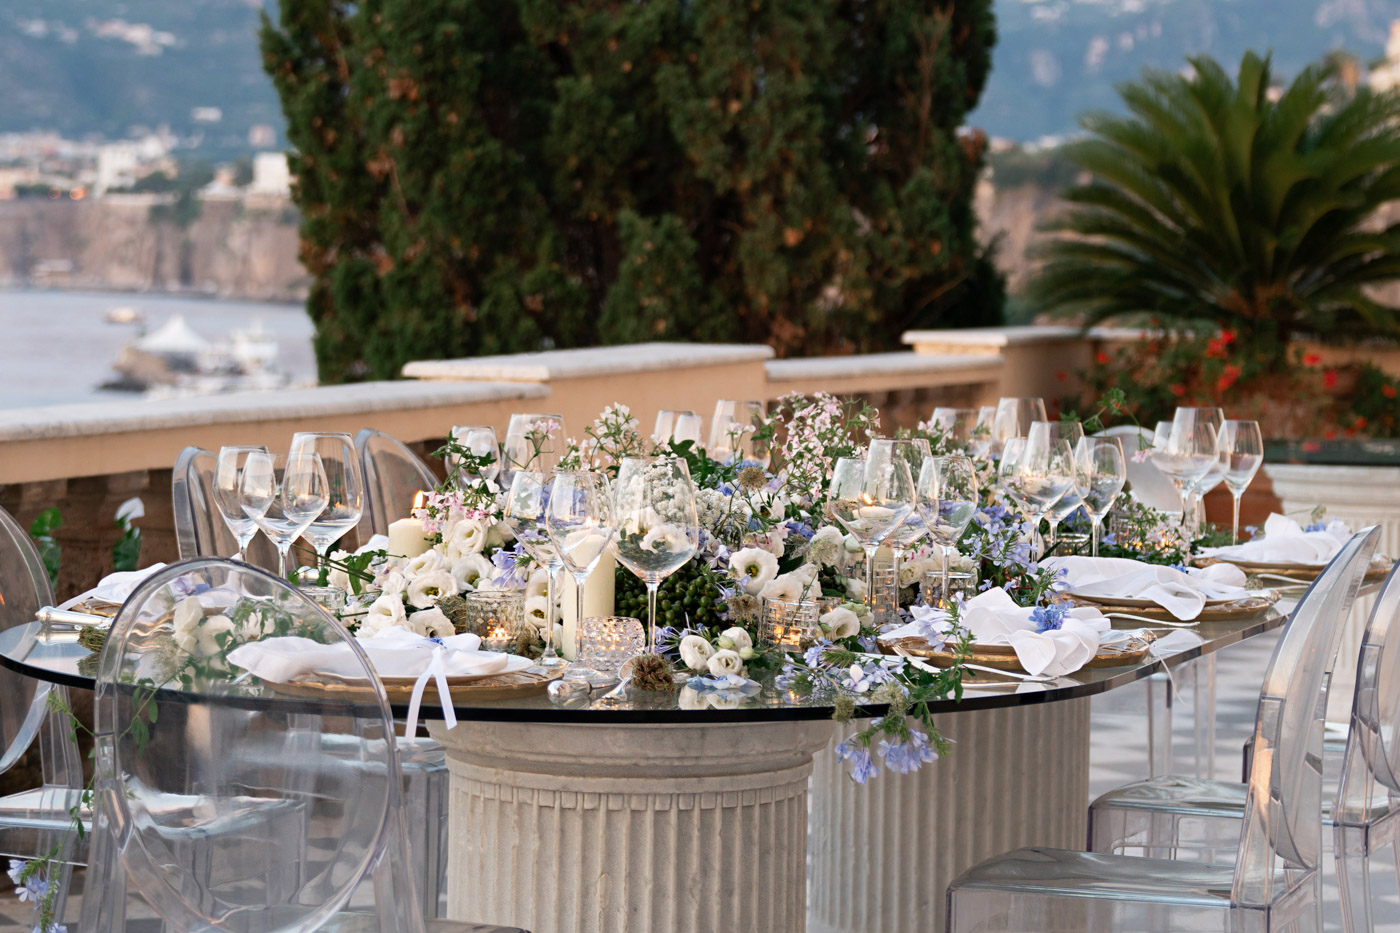 Wedding tablescape designed by Eddie Zaratsian at Villa Astor, Sorrento, Italy - photo by Adagion Studio